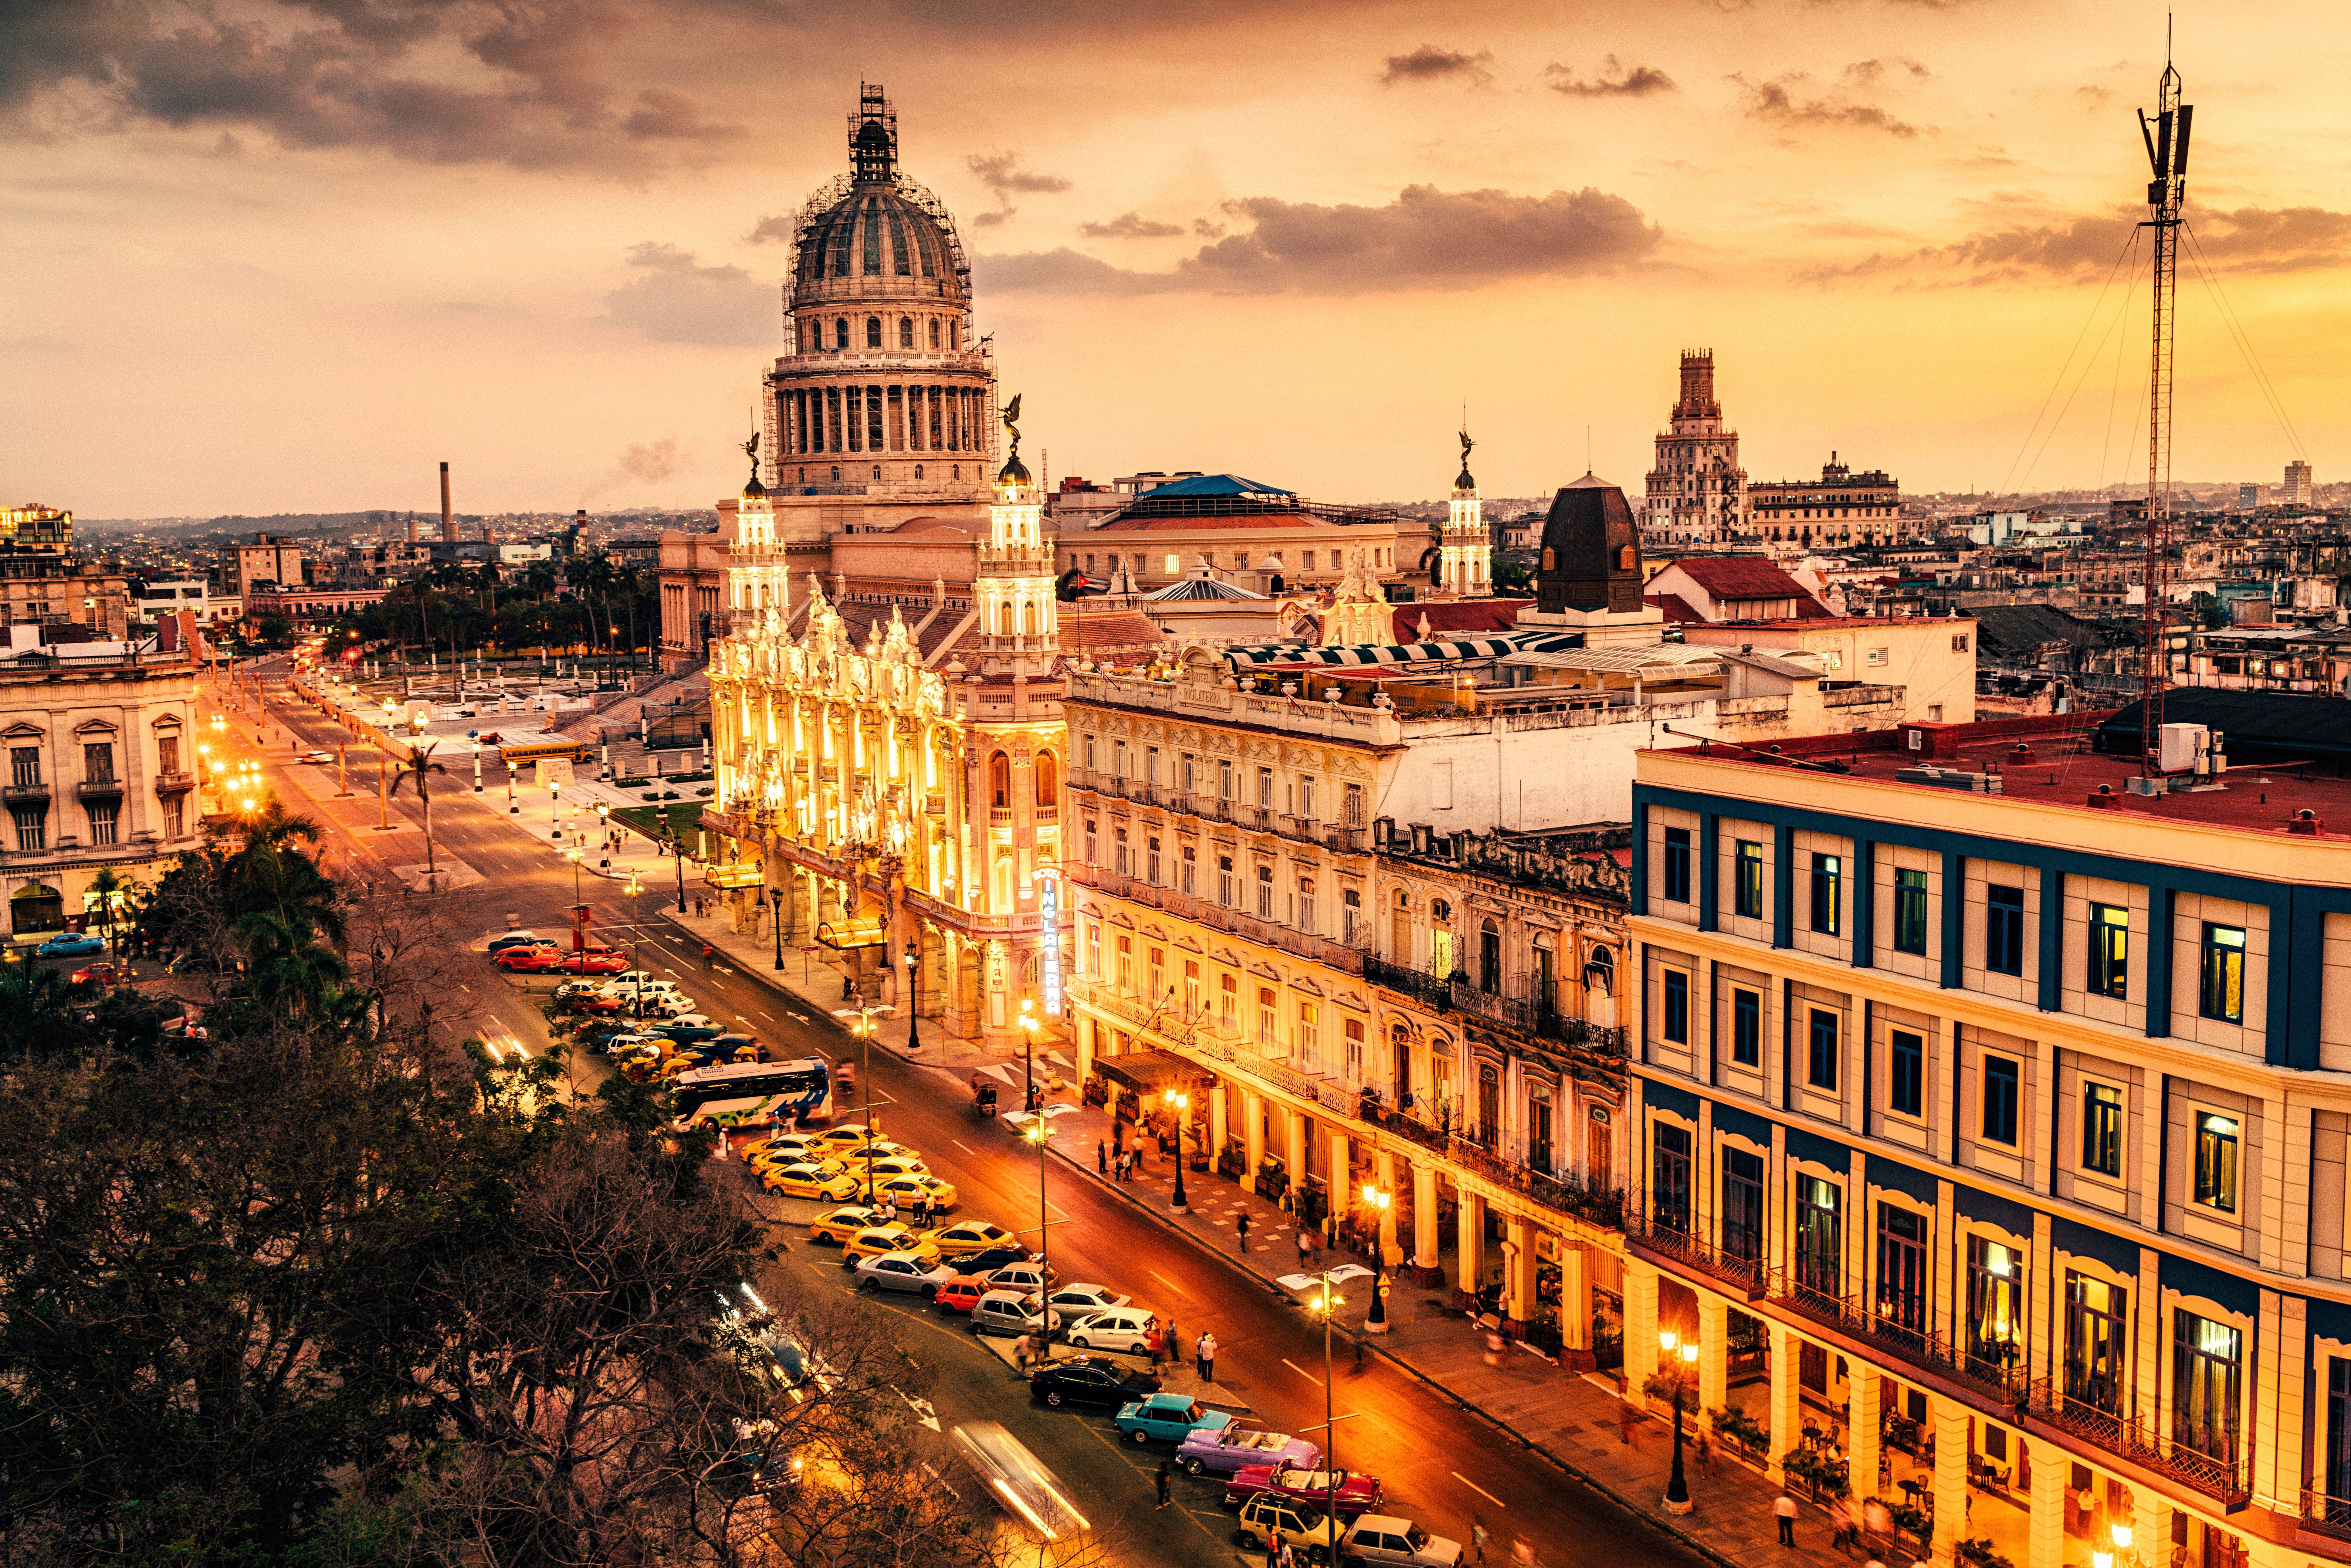 Skyline of Havana with Capitol building at dusk